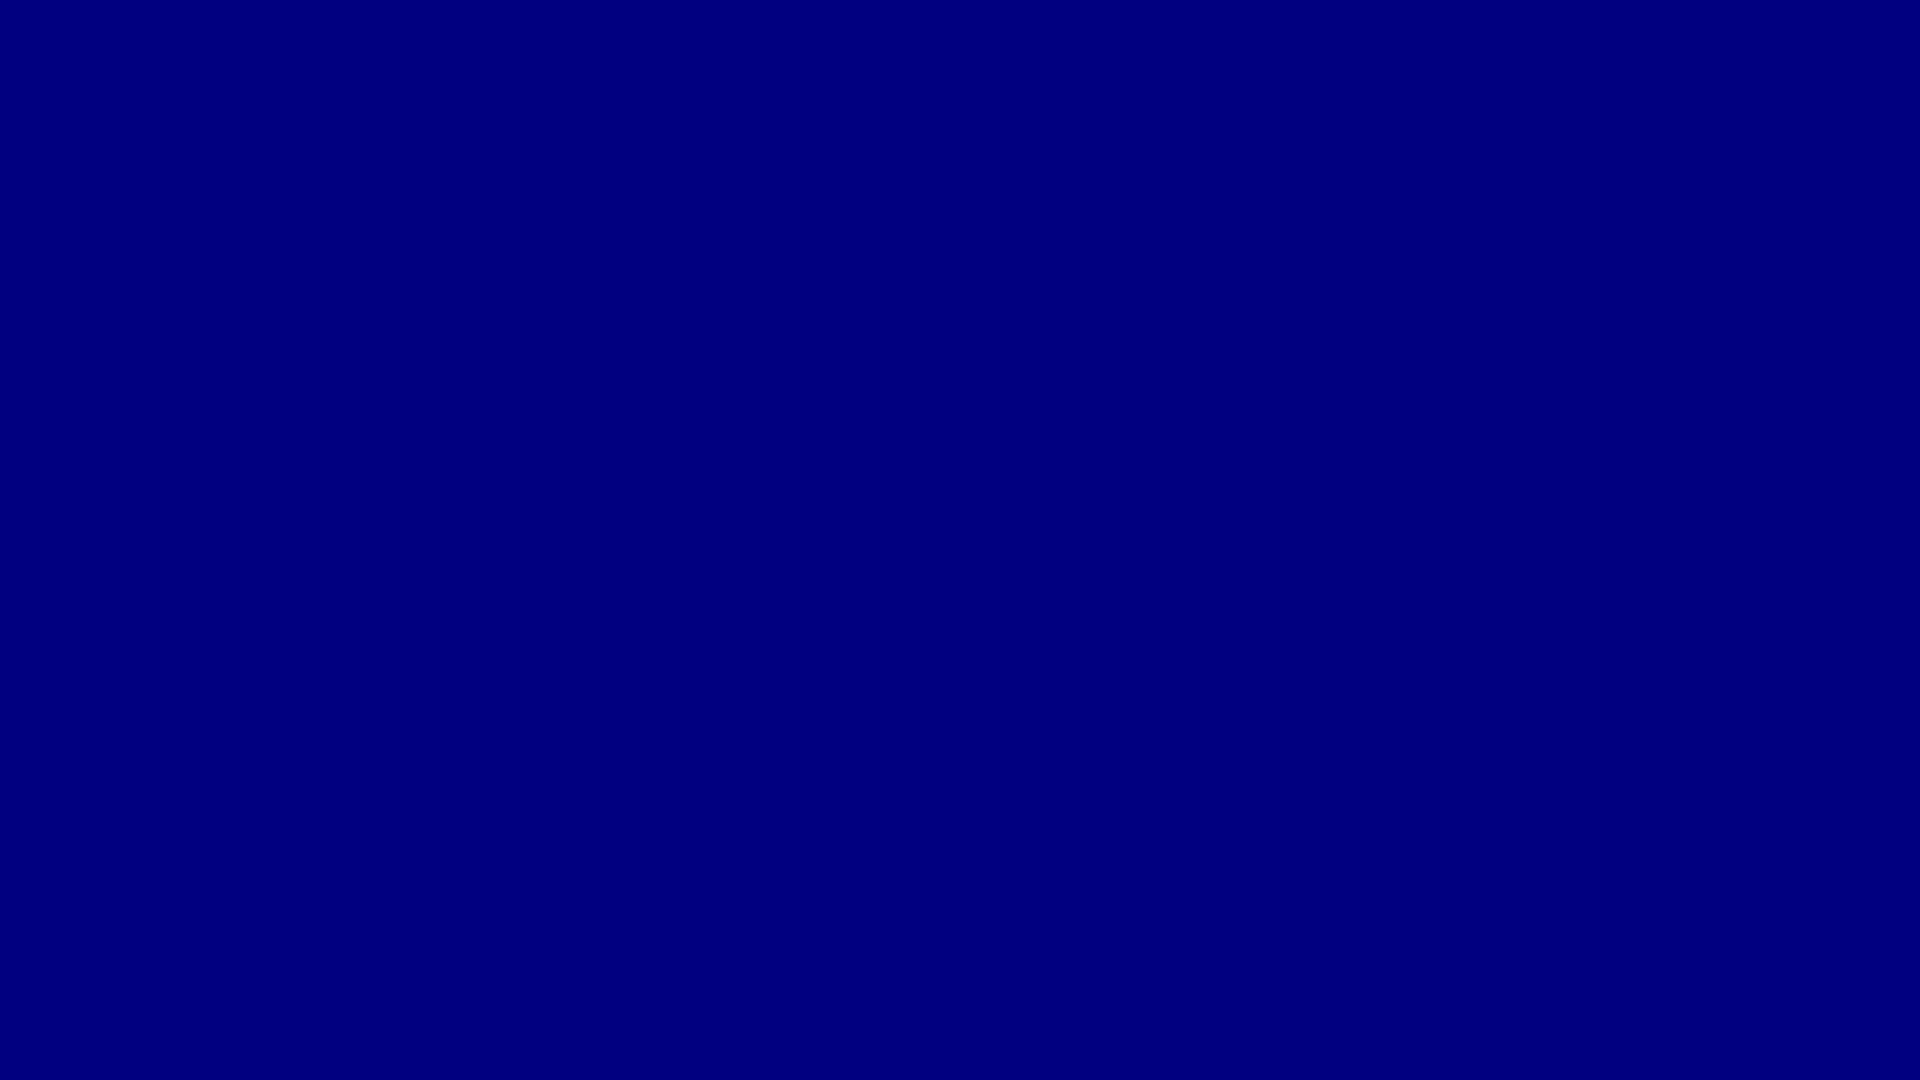 Navy Blue   Wallpaper High Definition High Quality 1920x1080